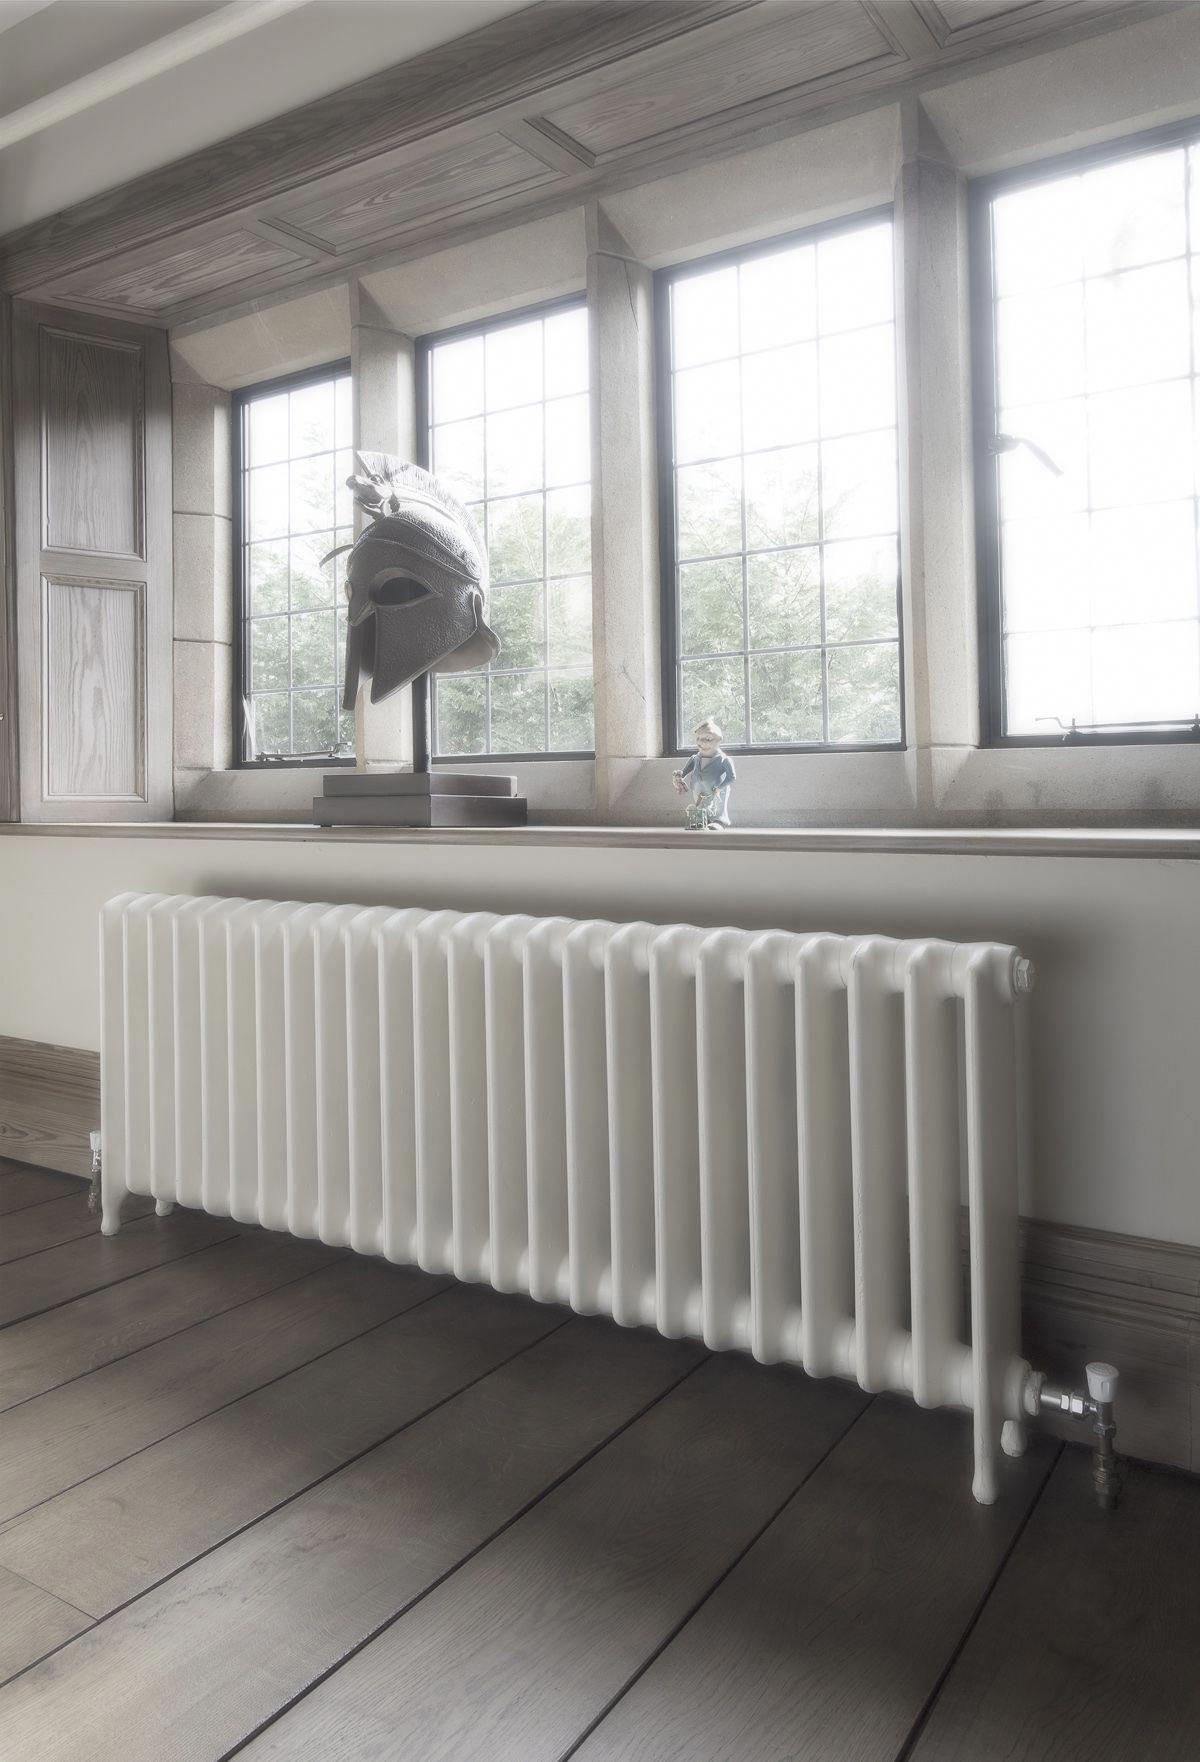 Designer Living Room Radiators: School Style Cast Iron Radiator Reclaimed And Refurbished